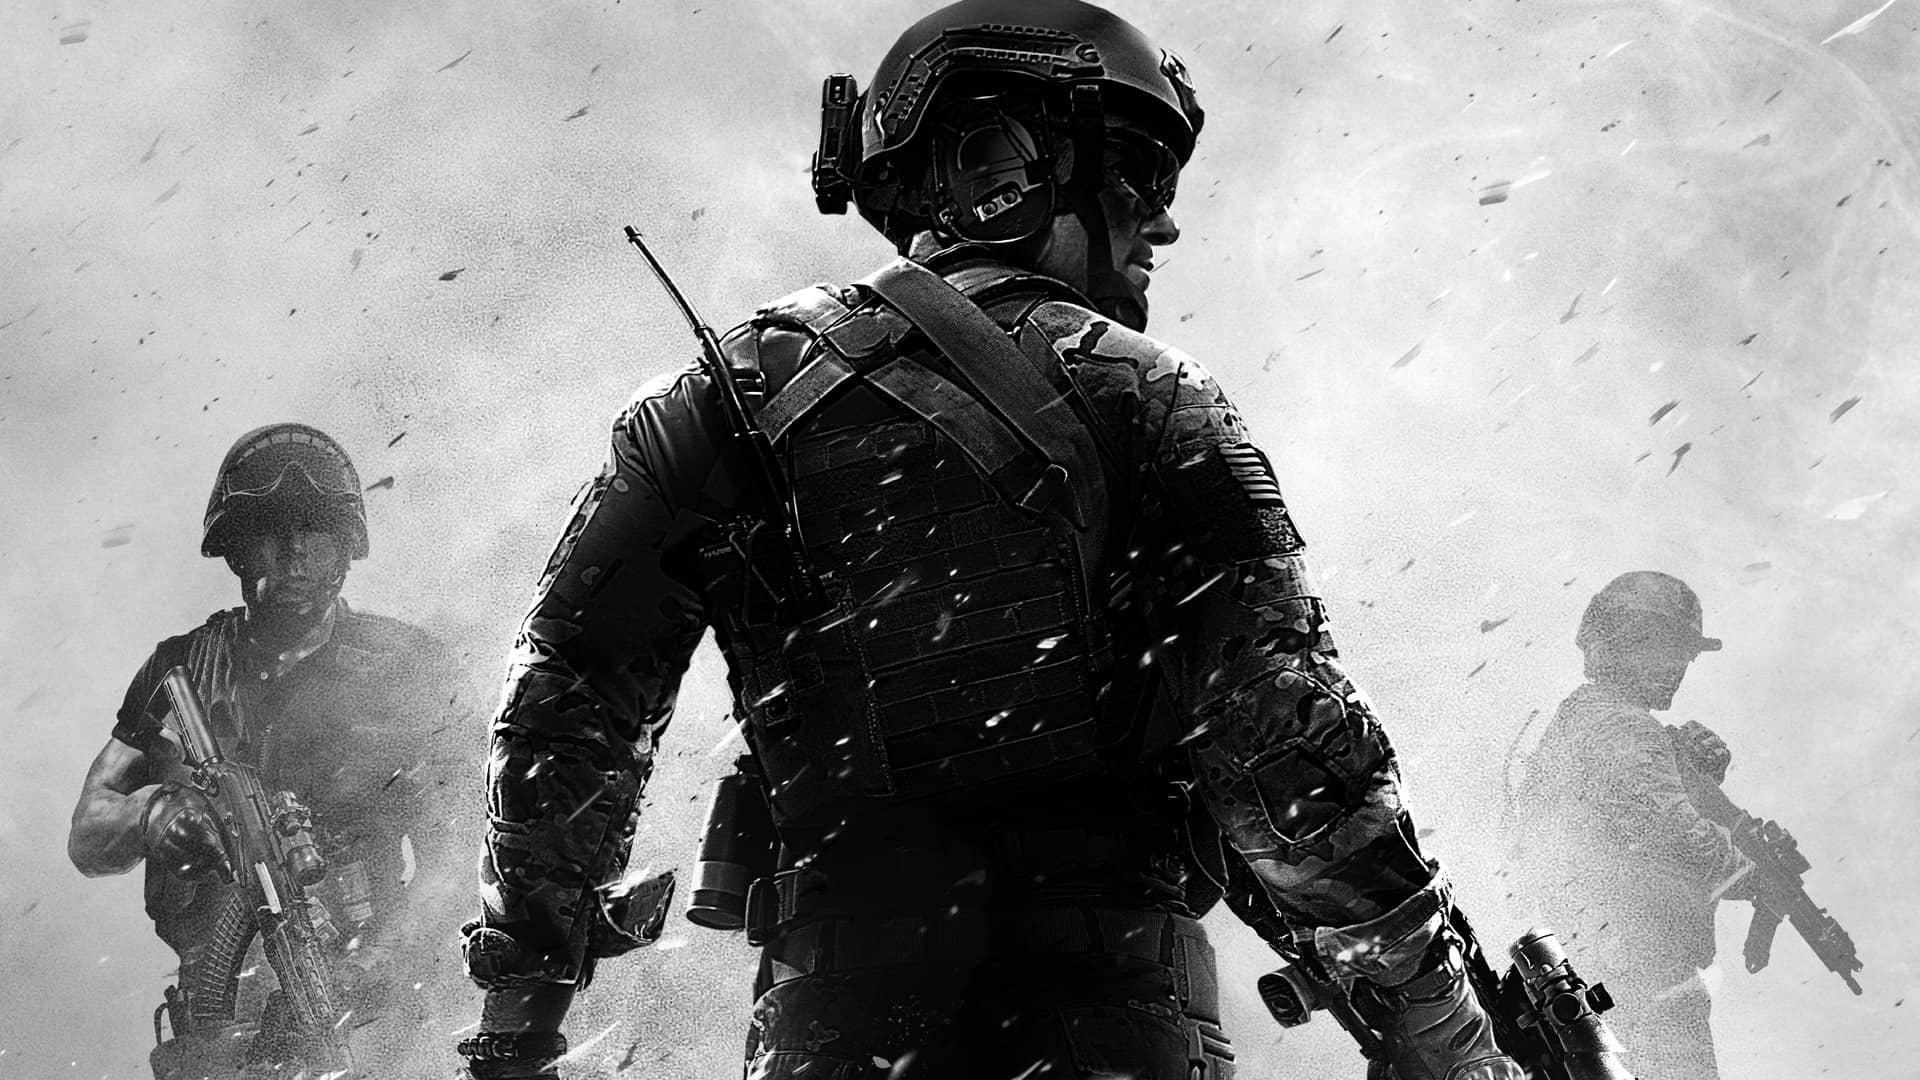 Call of Duty Wallpaper 074